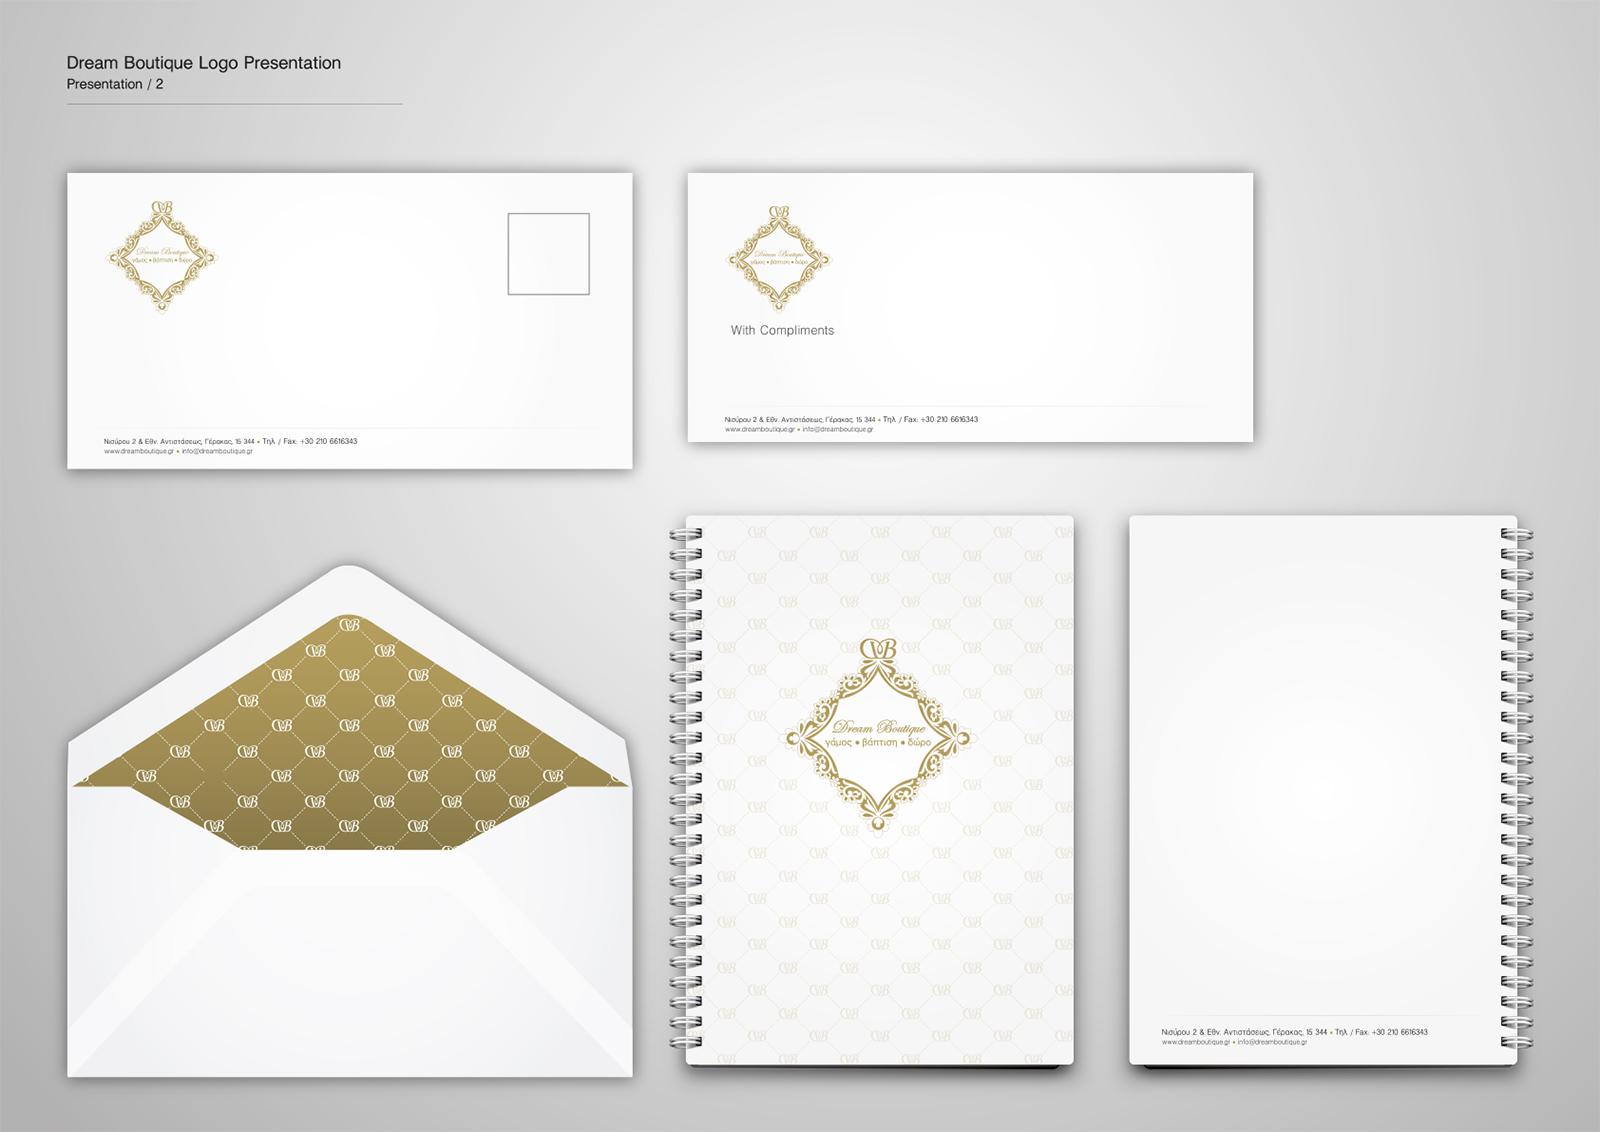 Corporate Identity Dream Boutique_Logo Presentation_2_Yianart